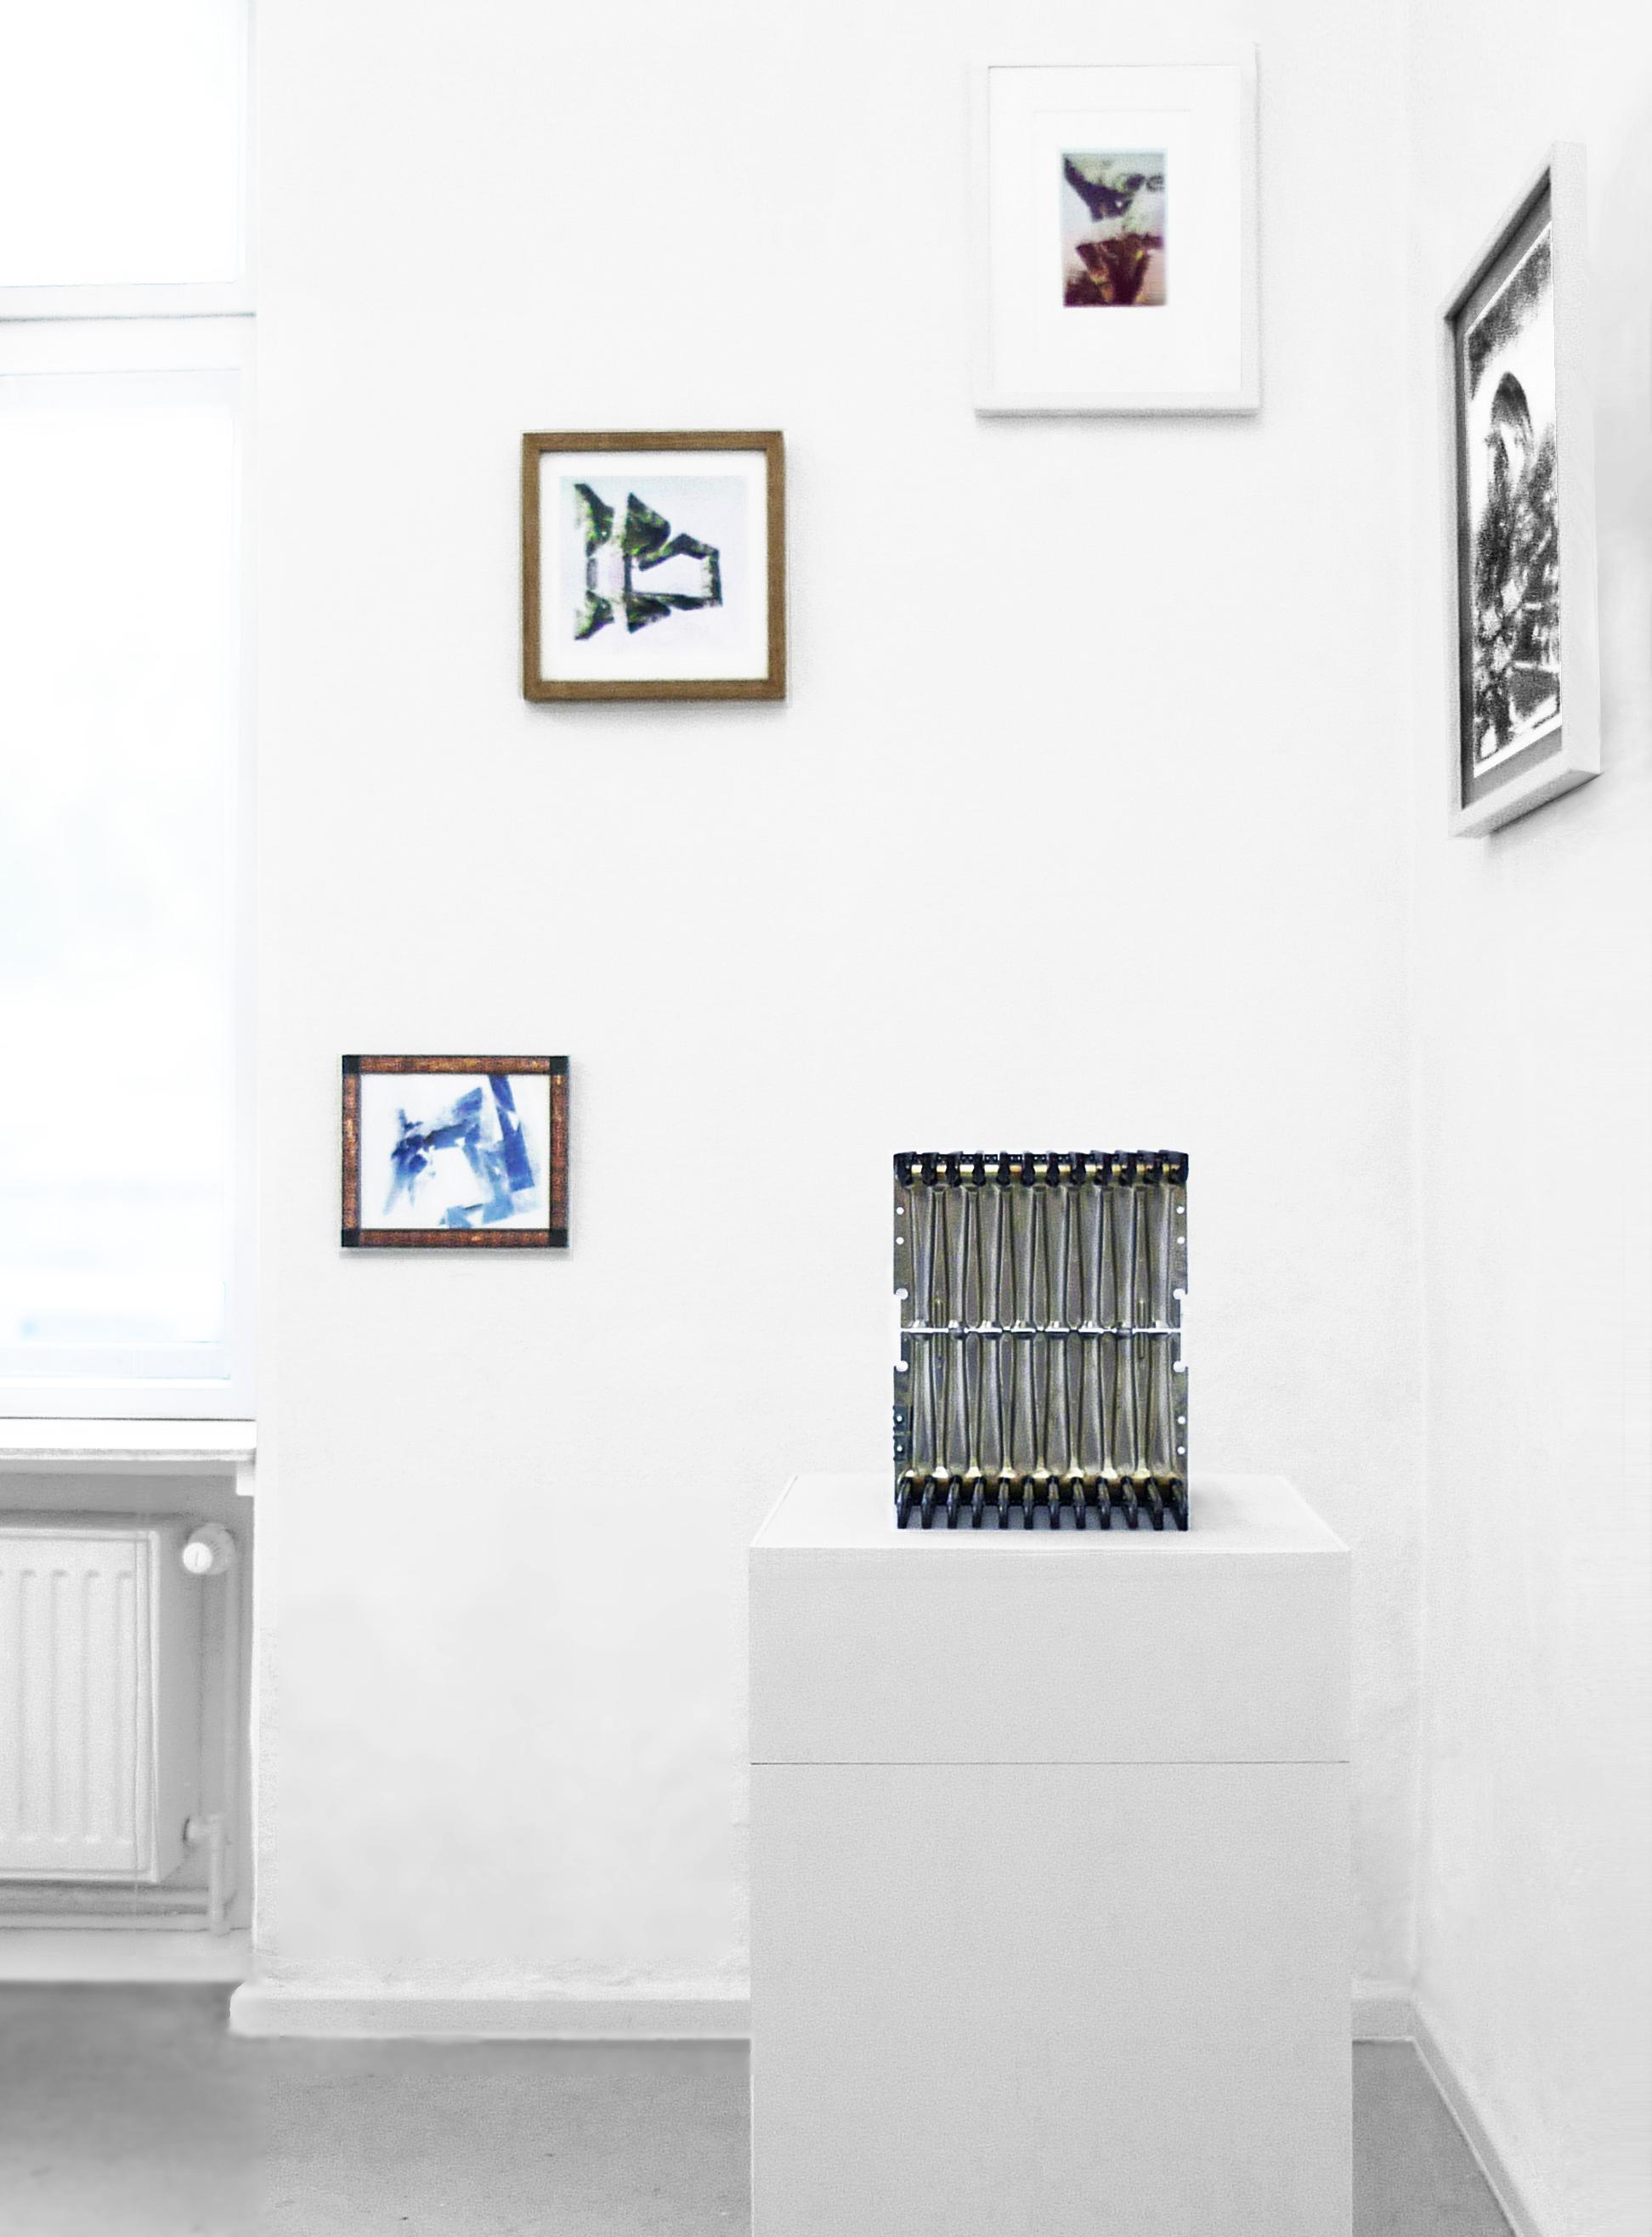 22.05. - 06.06. 2015 CultD Galerie, Berlin: `John Maibohm